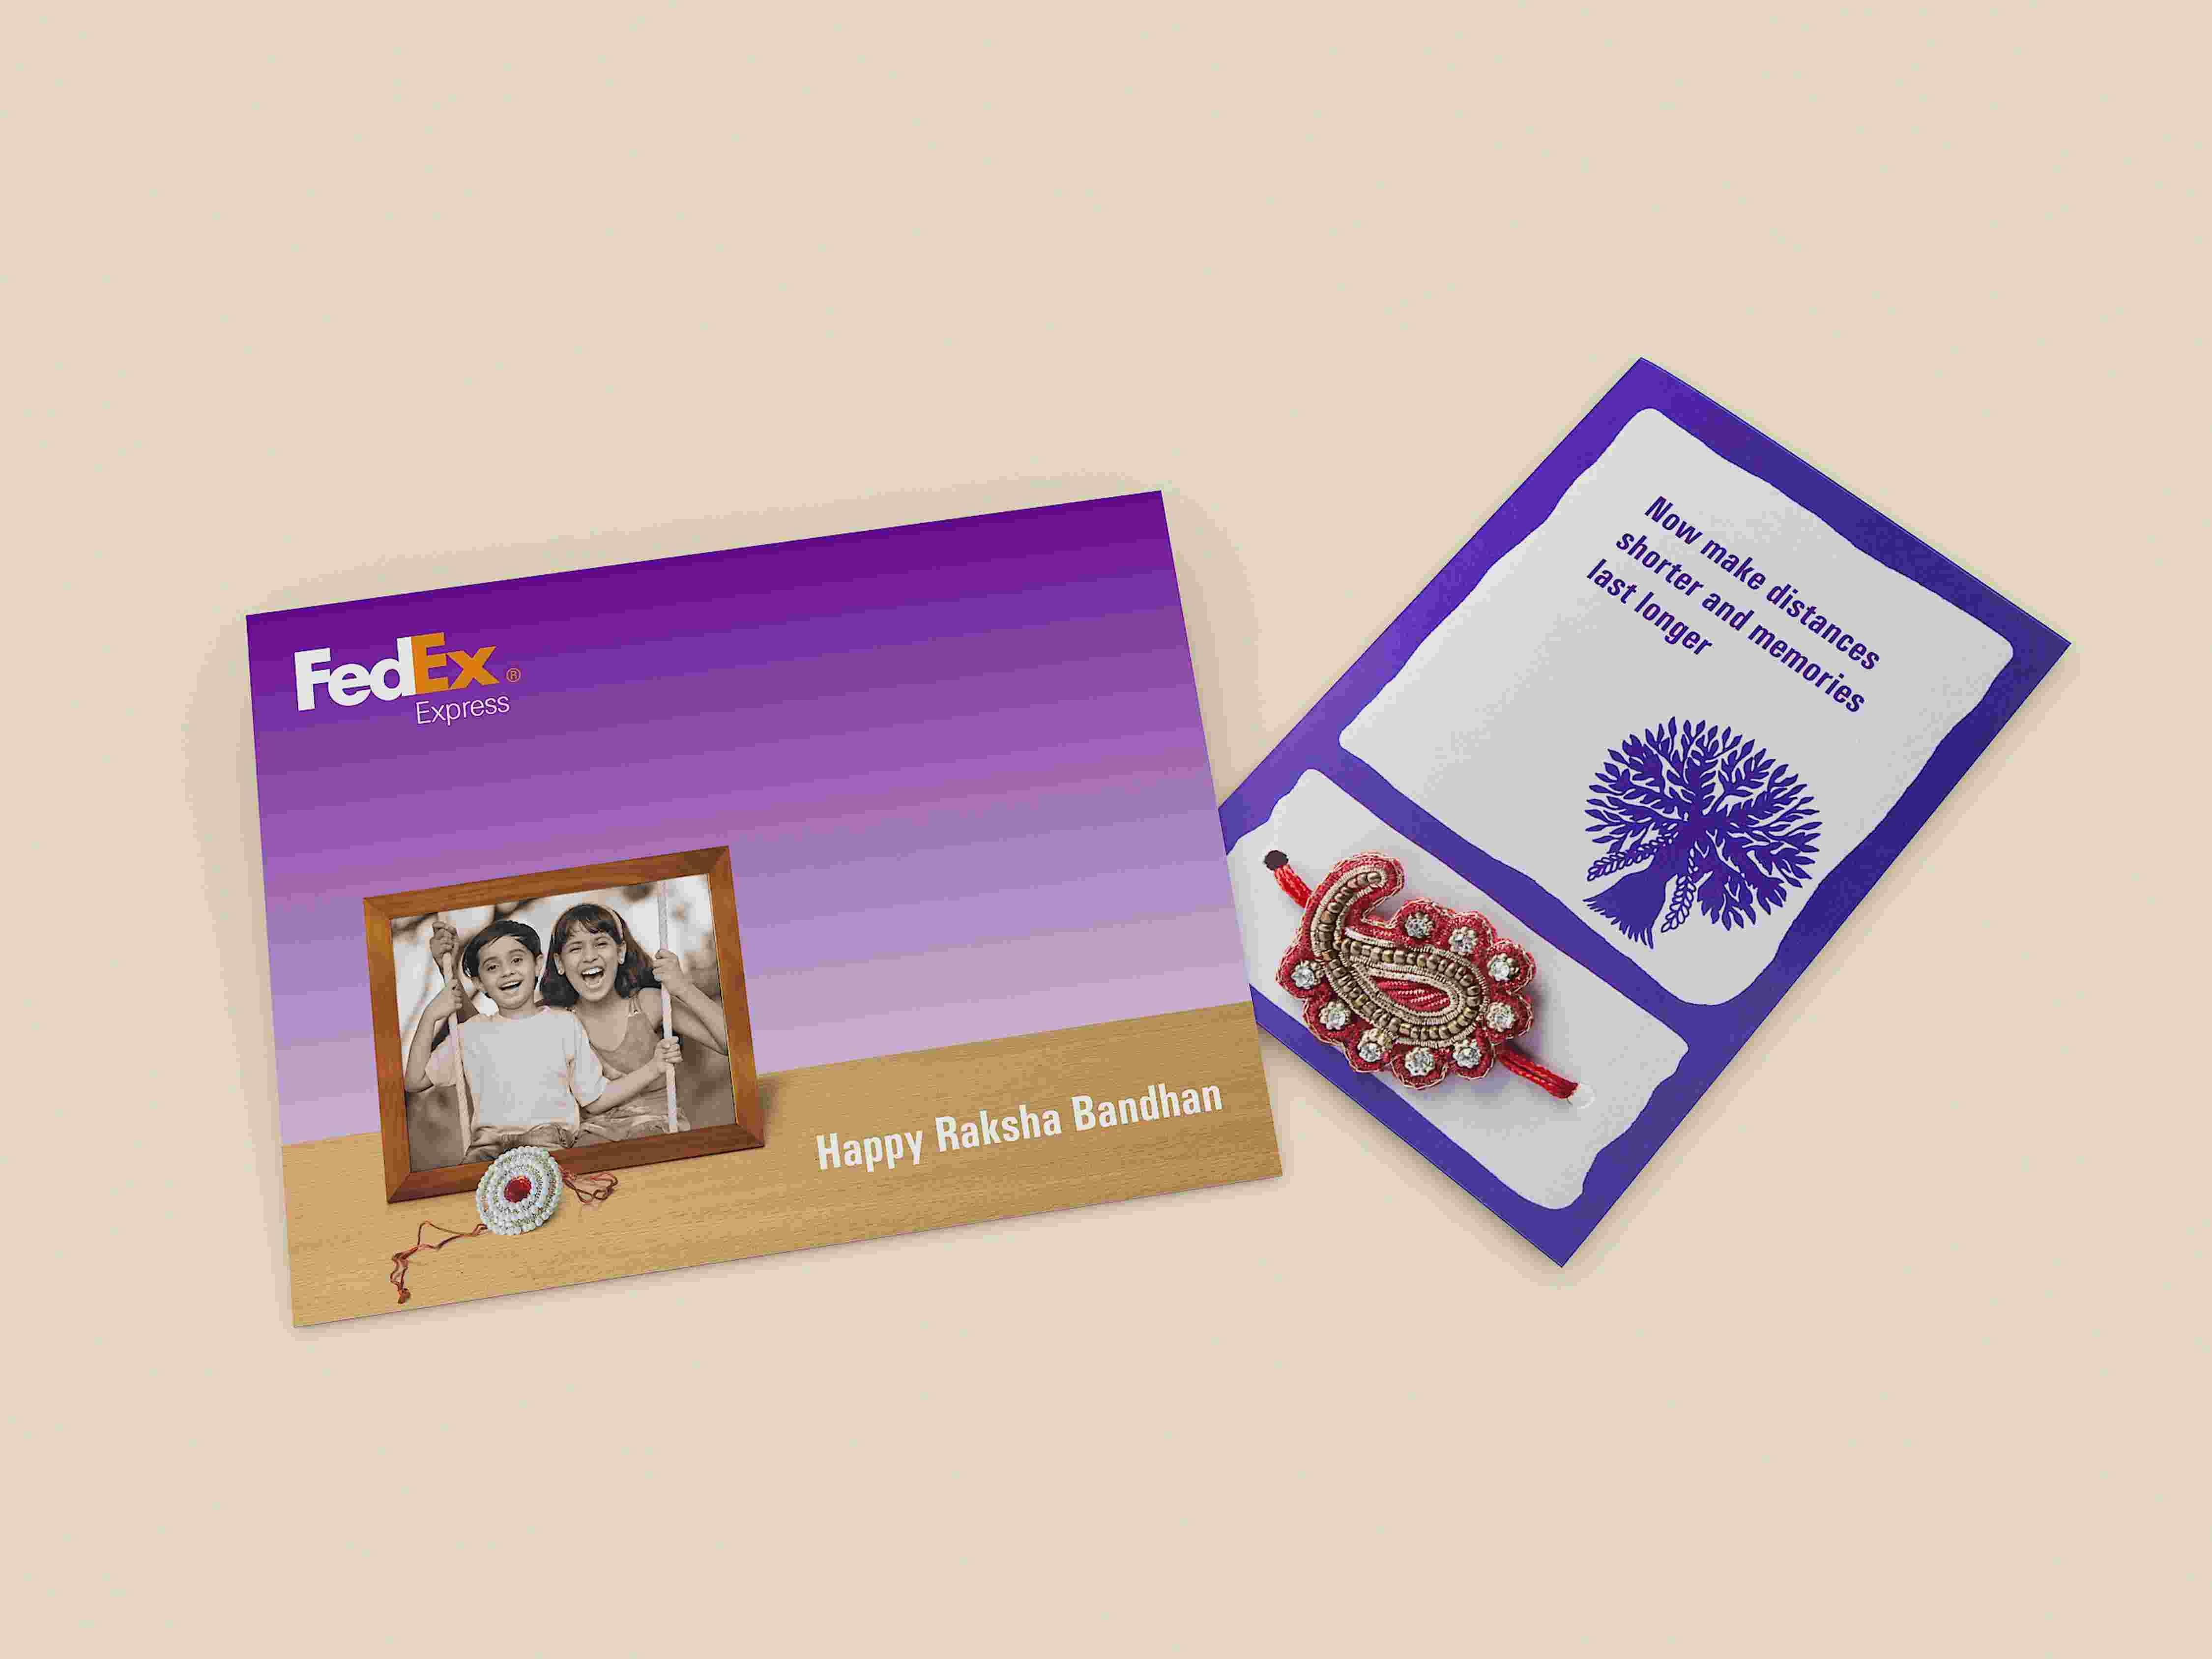 Fedex rakhi offer orient publication fedex rakhi package inclusive of a beautiful rakhi greeting card and flat rate shipping kristyandbryce Choice Image